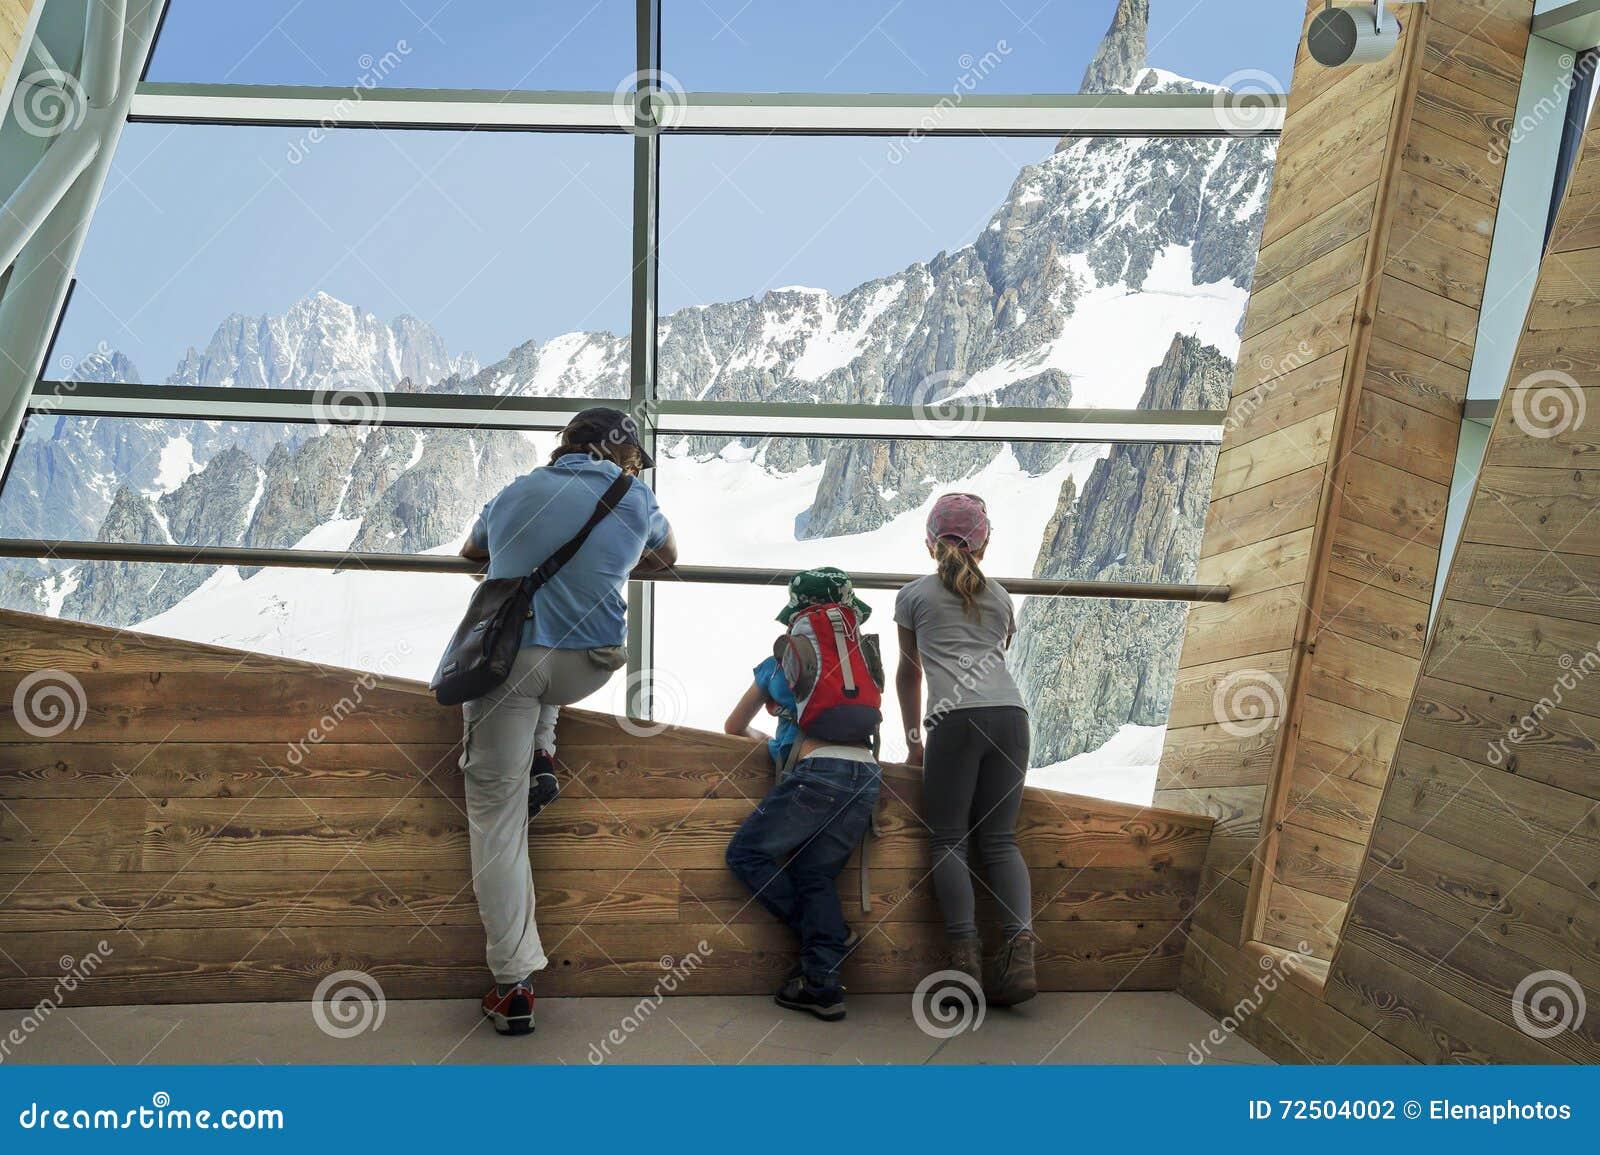 Punta Helbronner von Skyway, Monte Bianco-Anschluss, Courmayeur